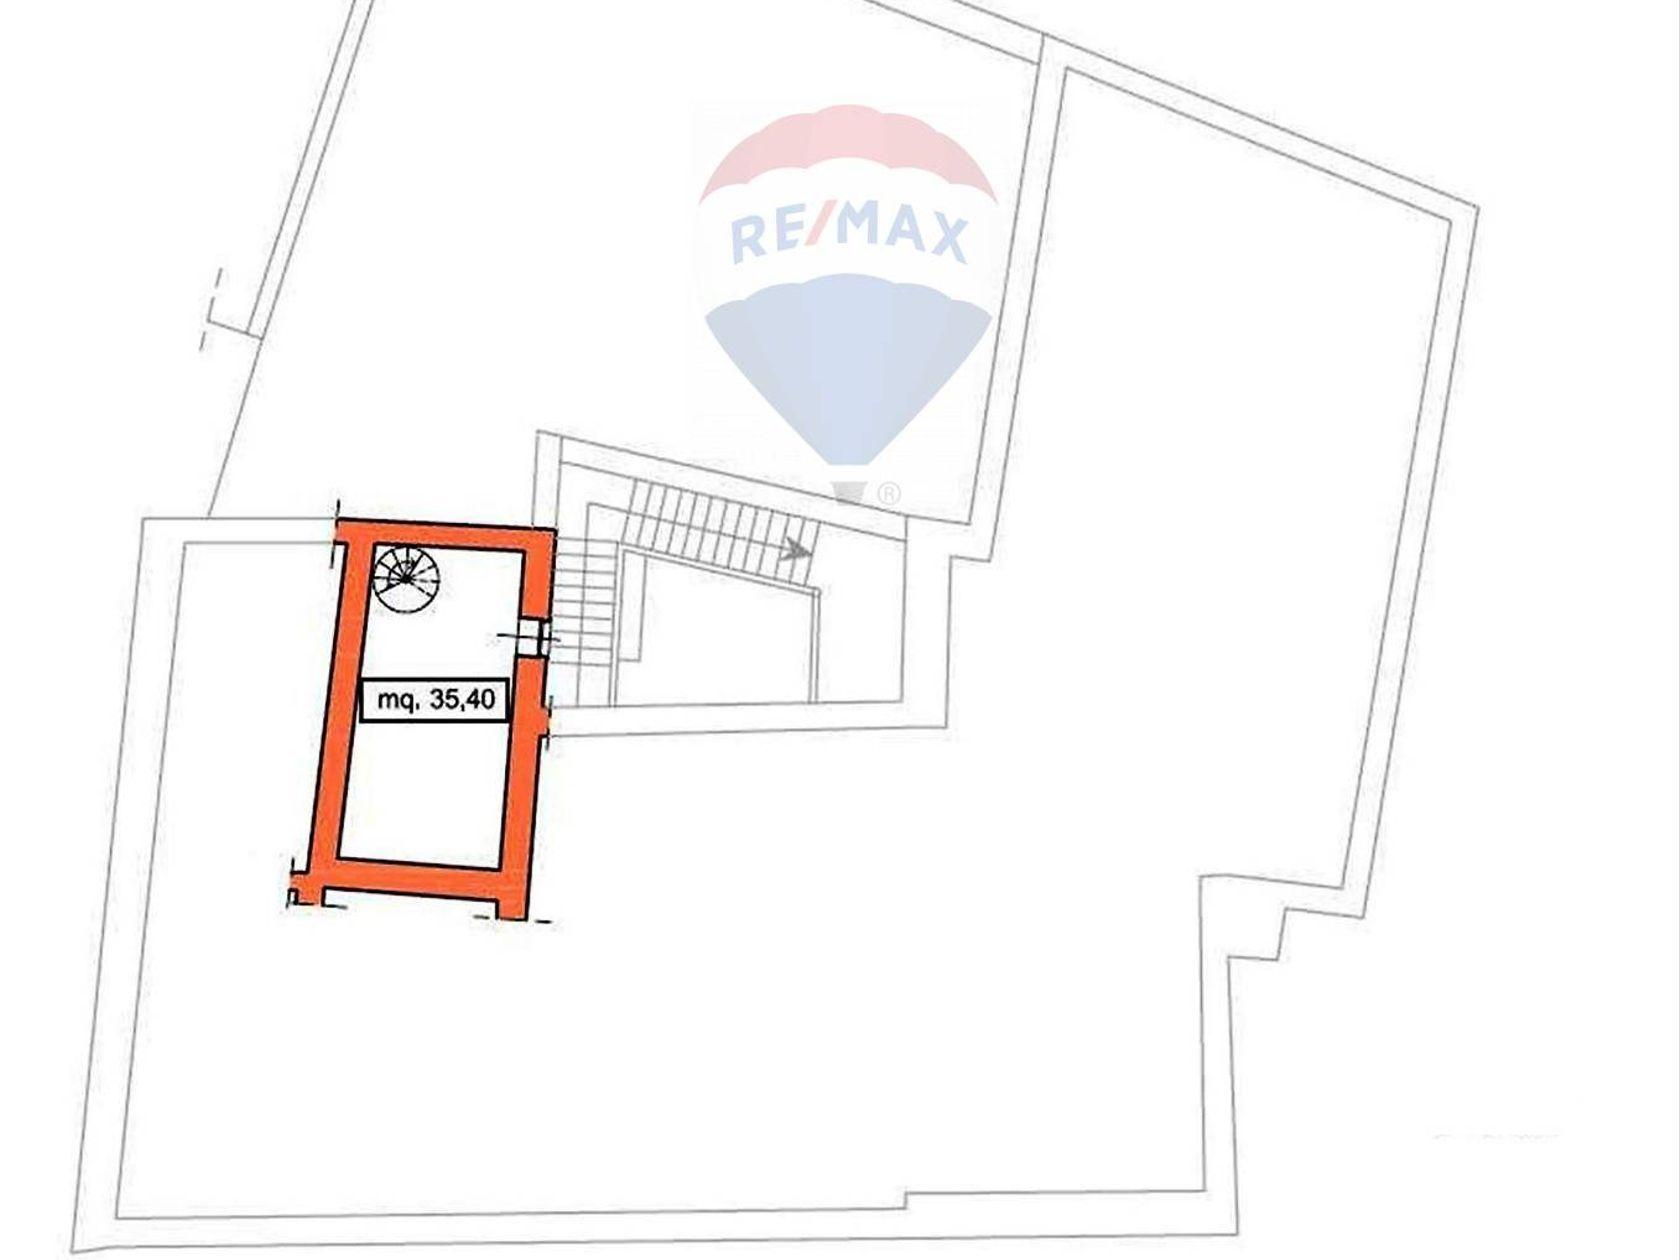 Casa Indipendente Trastevere, Roma, RM Vendita - Planimetria 2